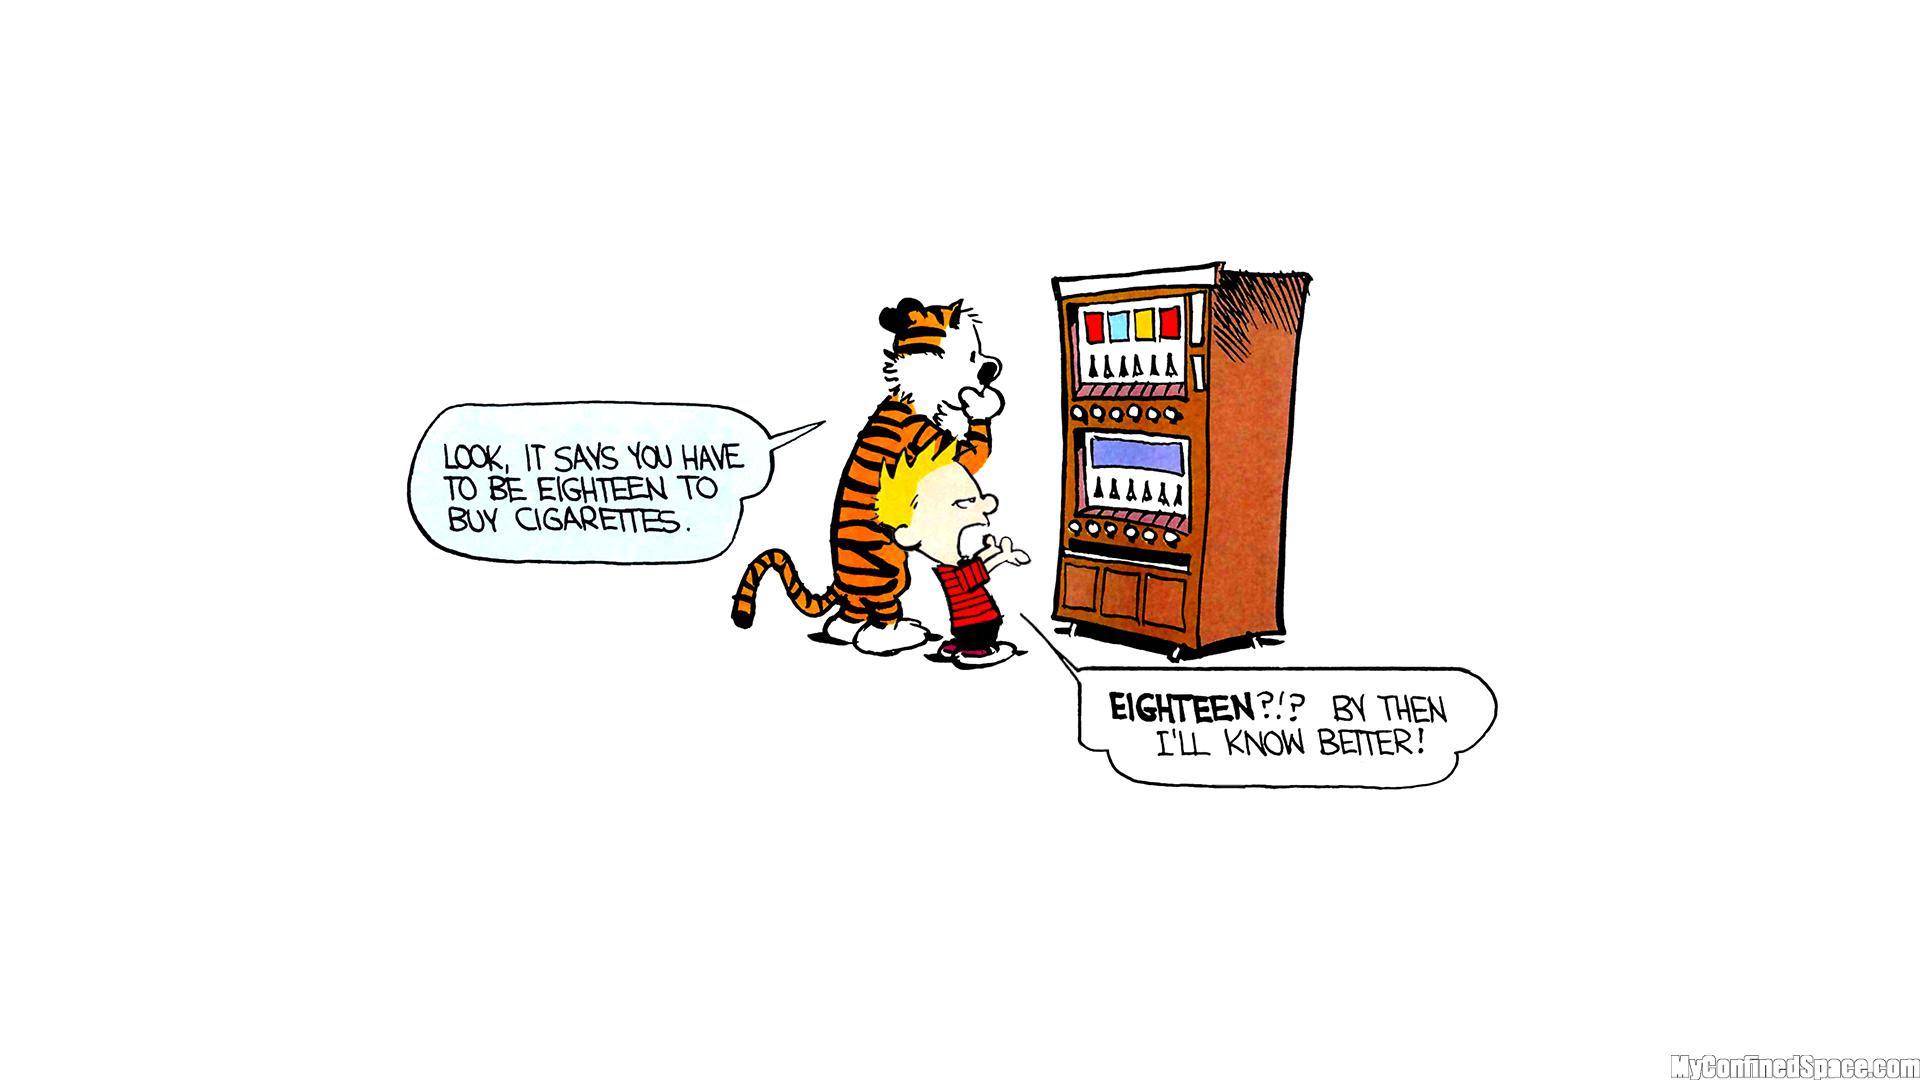 Hd Calvin Hobbes Comics Free Images Wallpaper Download Free 141280